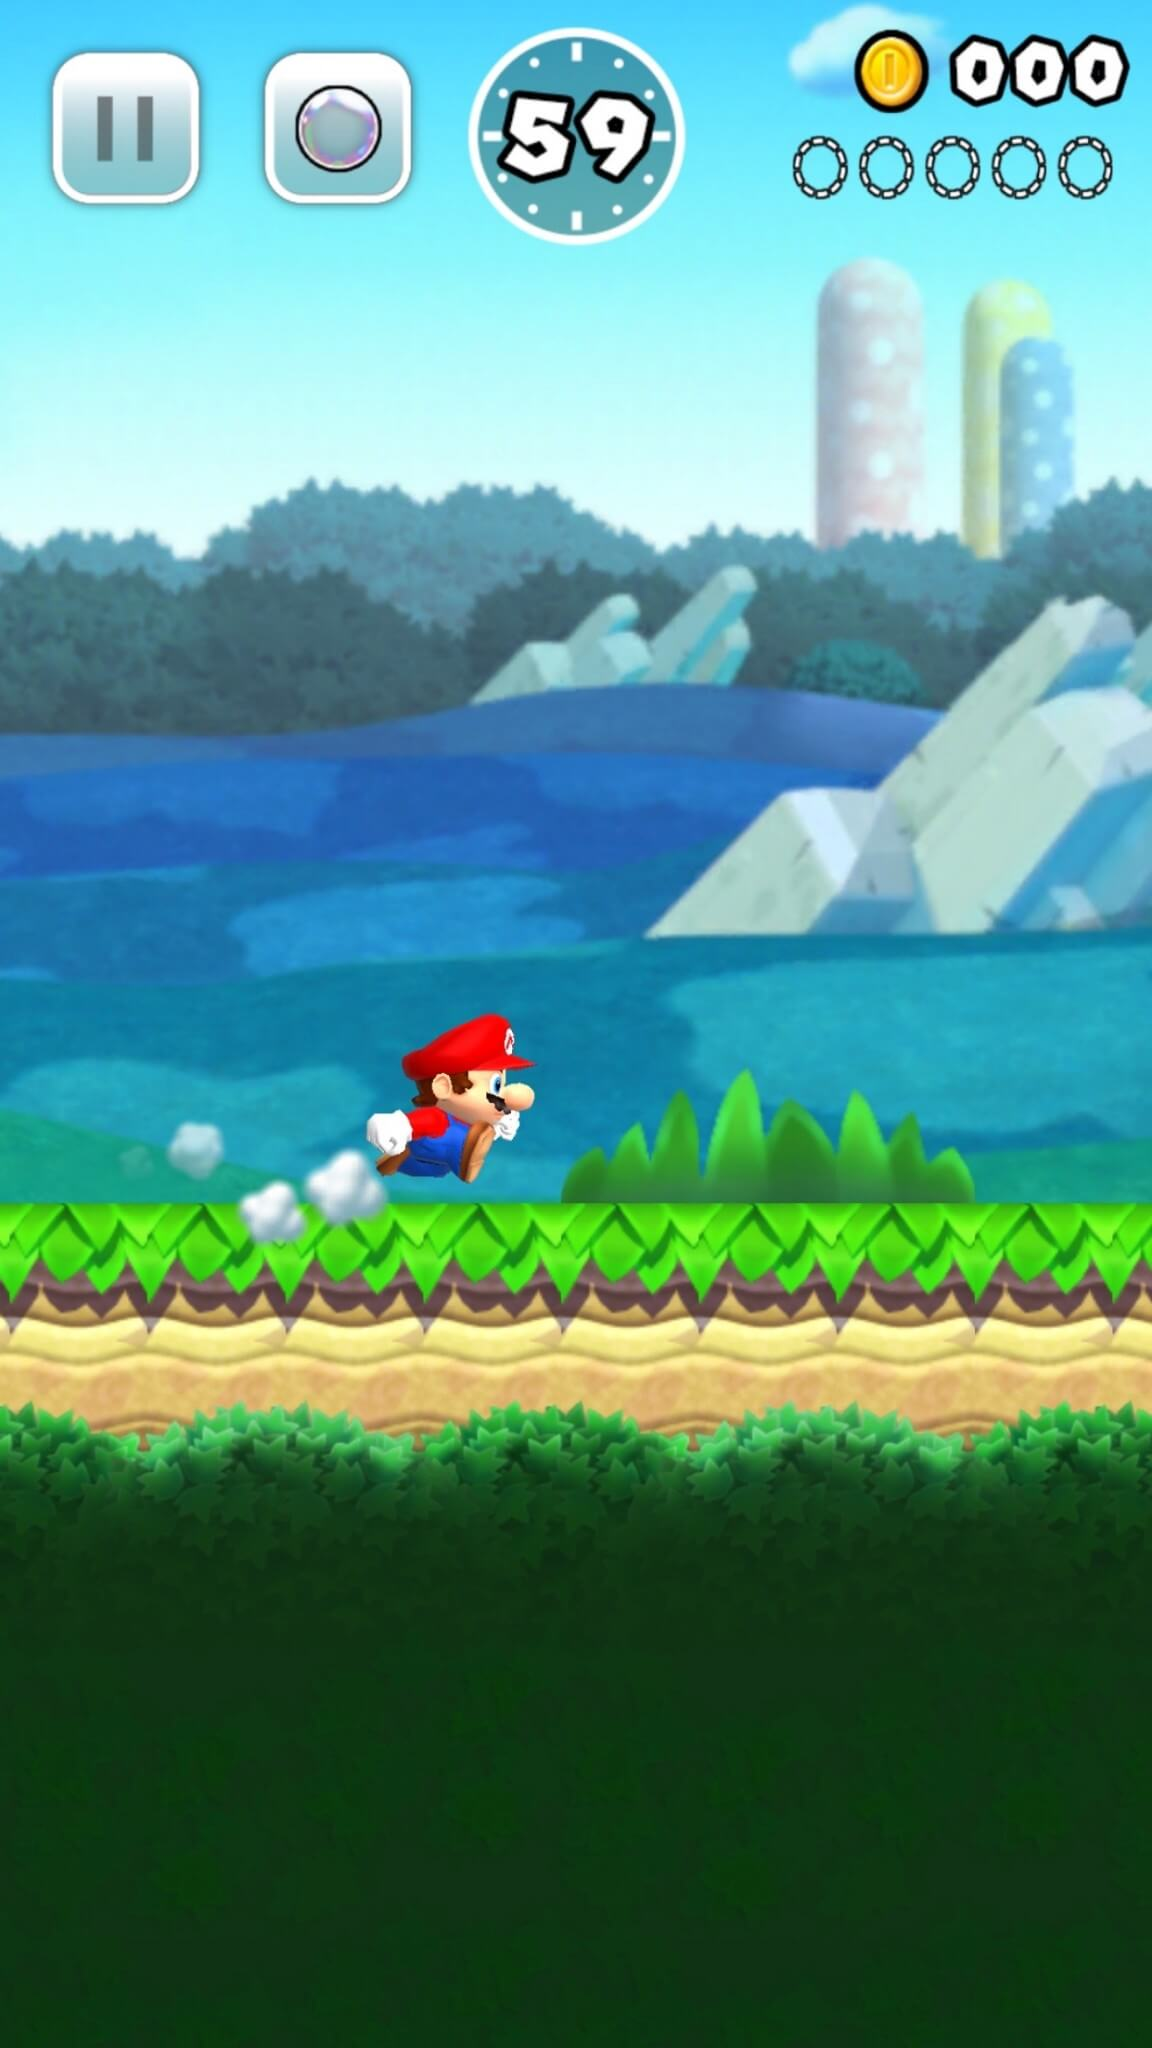 Super Mario Run: Mario unterwegs auf dem iPhone (Bildrechte: Nintendo)